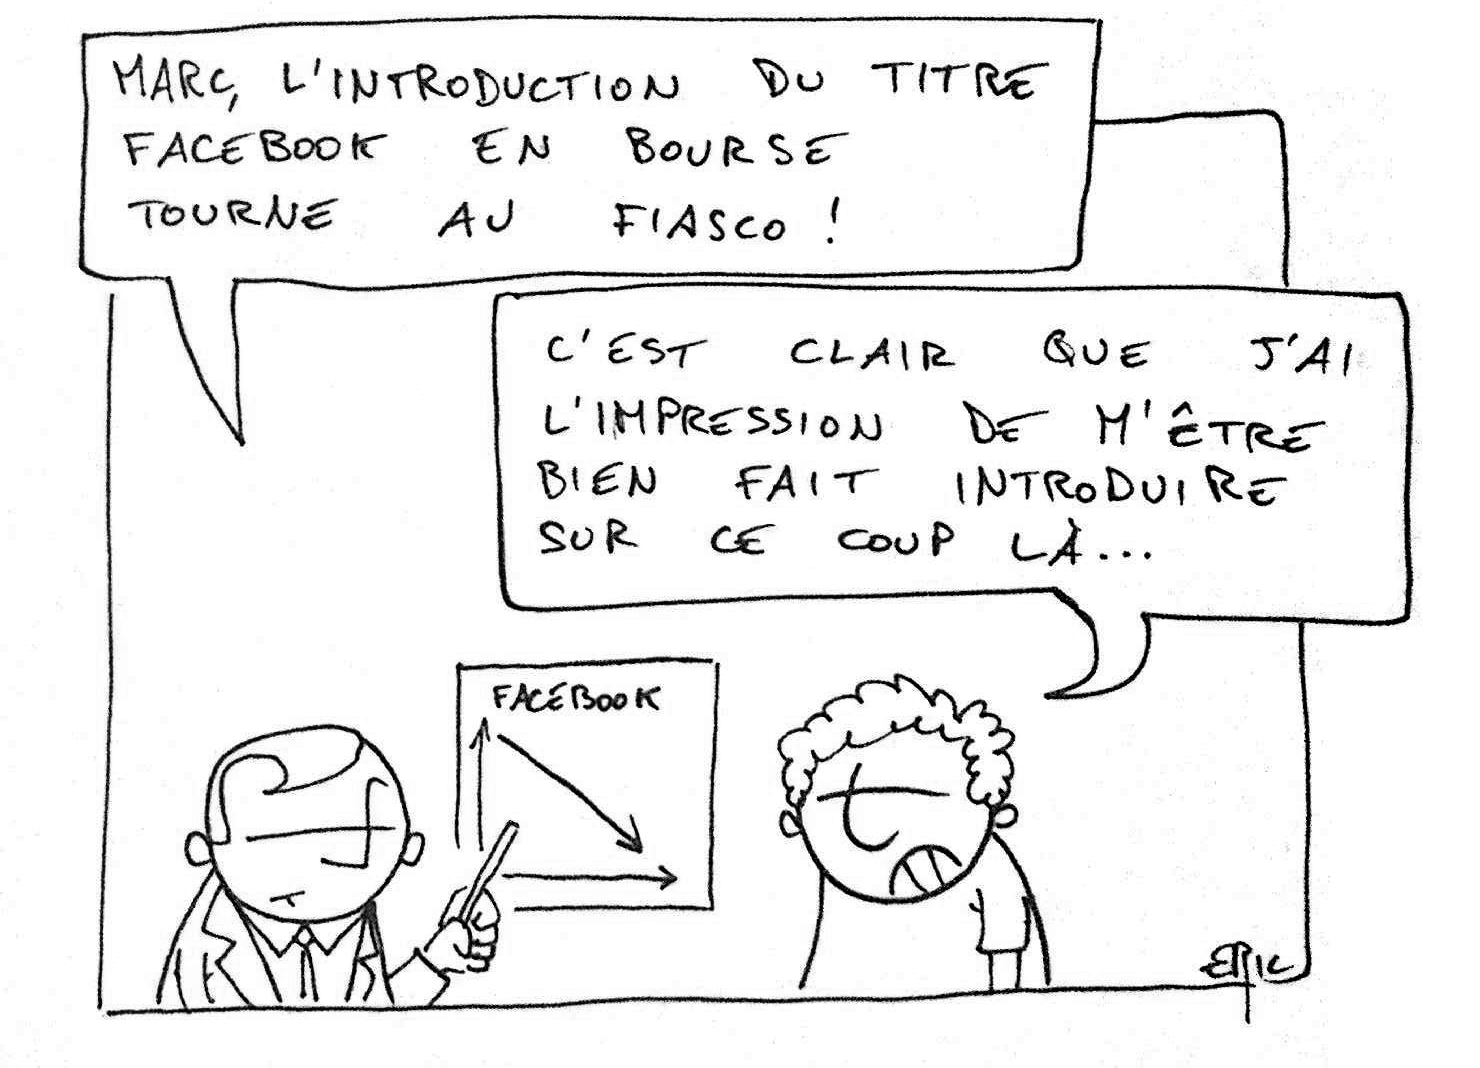 introduction_facebook_en_bourse